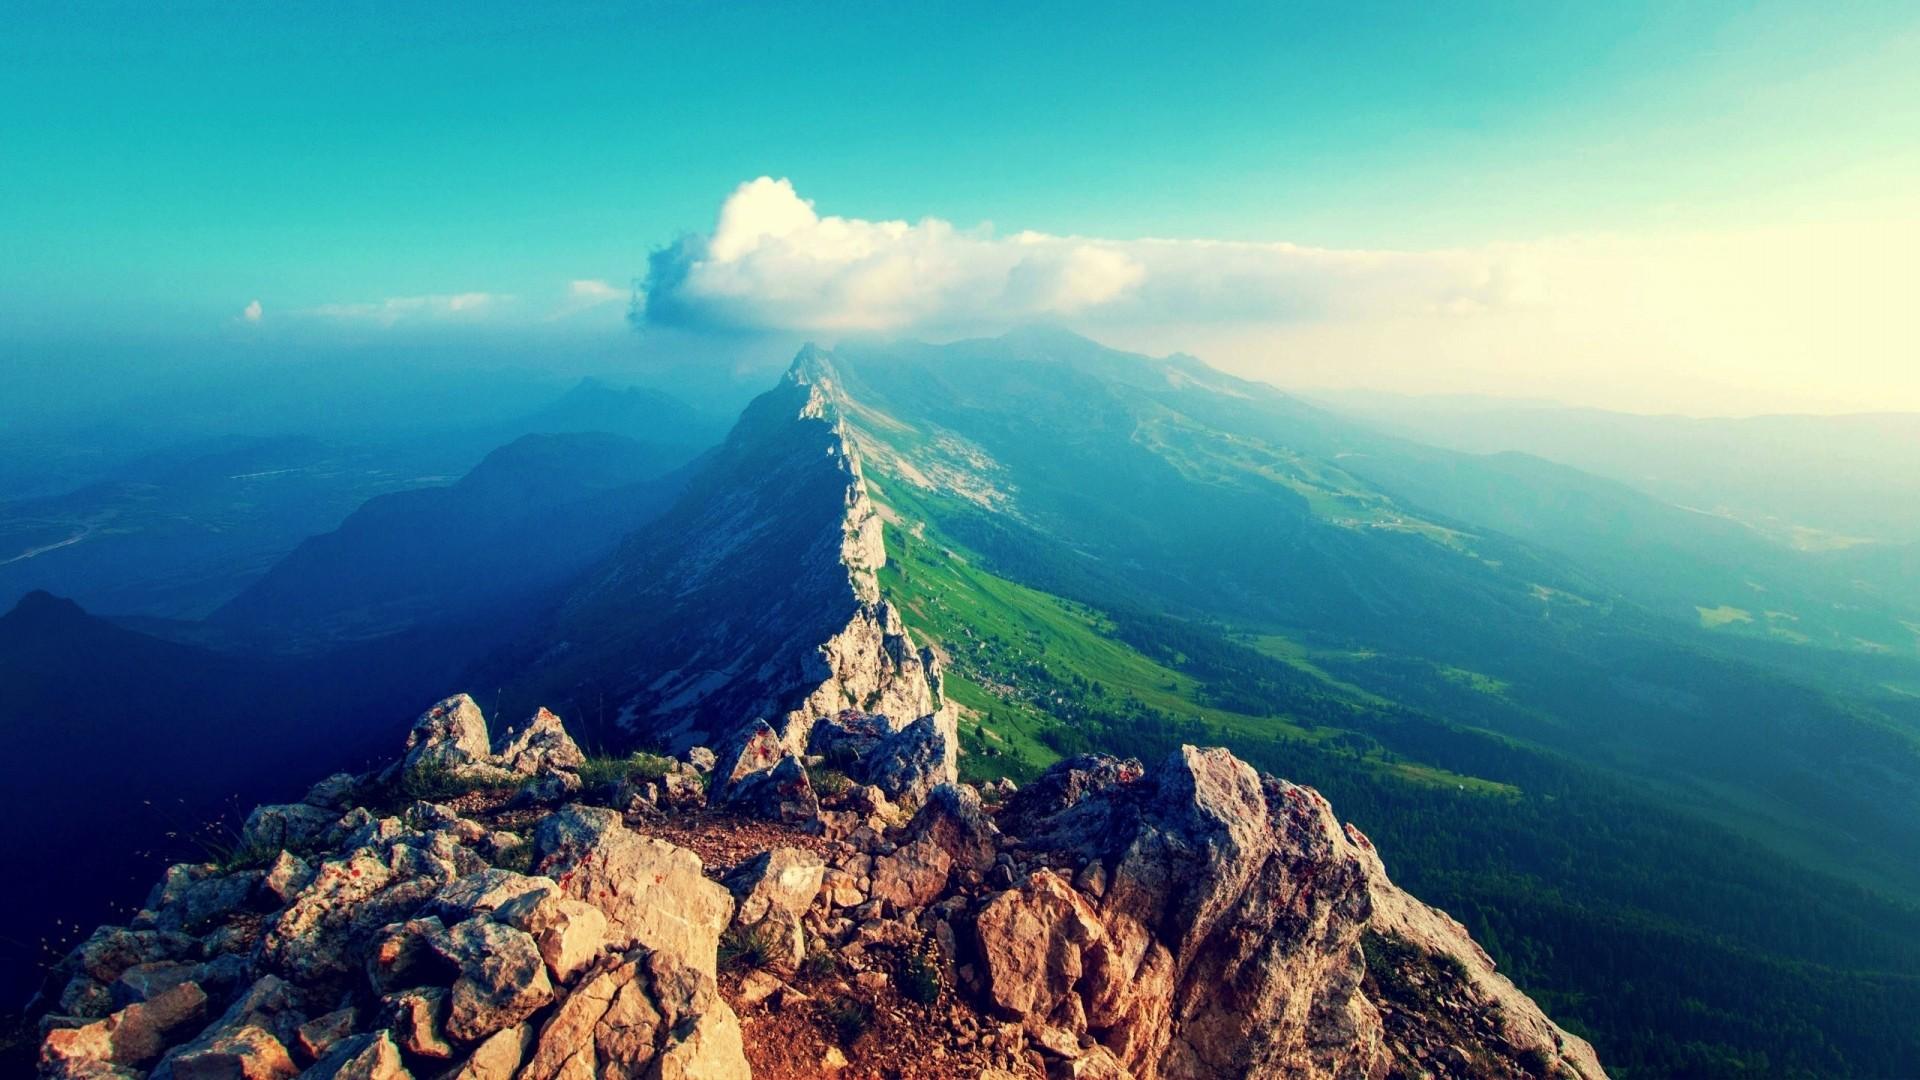 Wallpaper mountains, sky, clouds, mountain range, stones